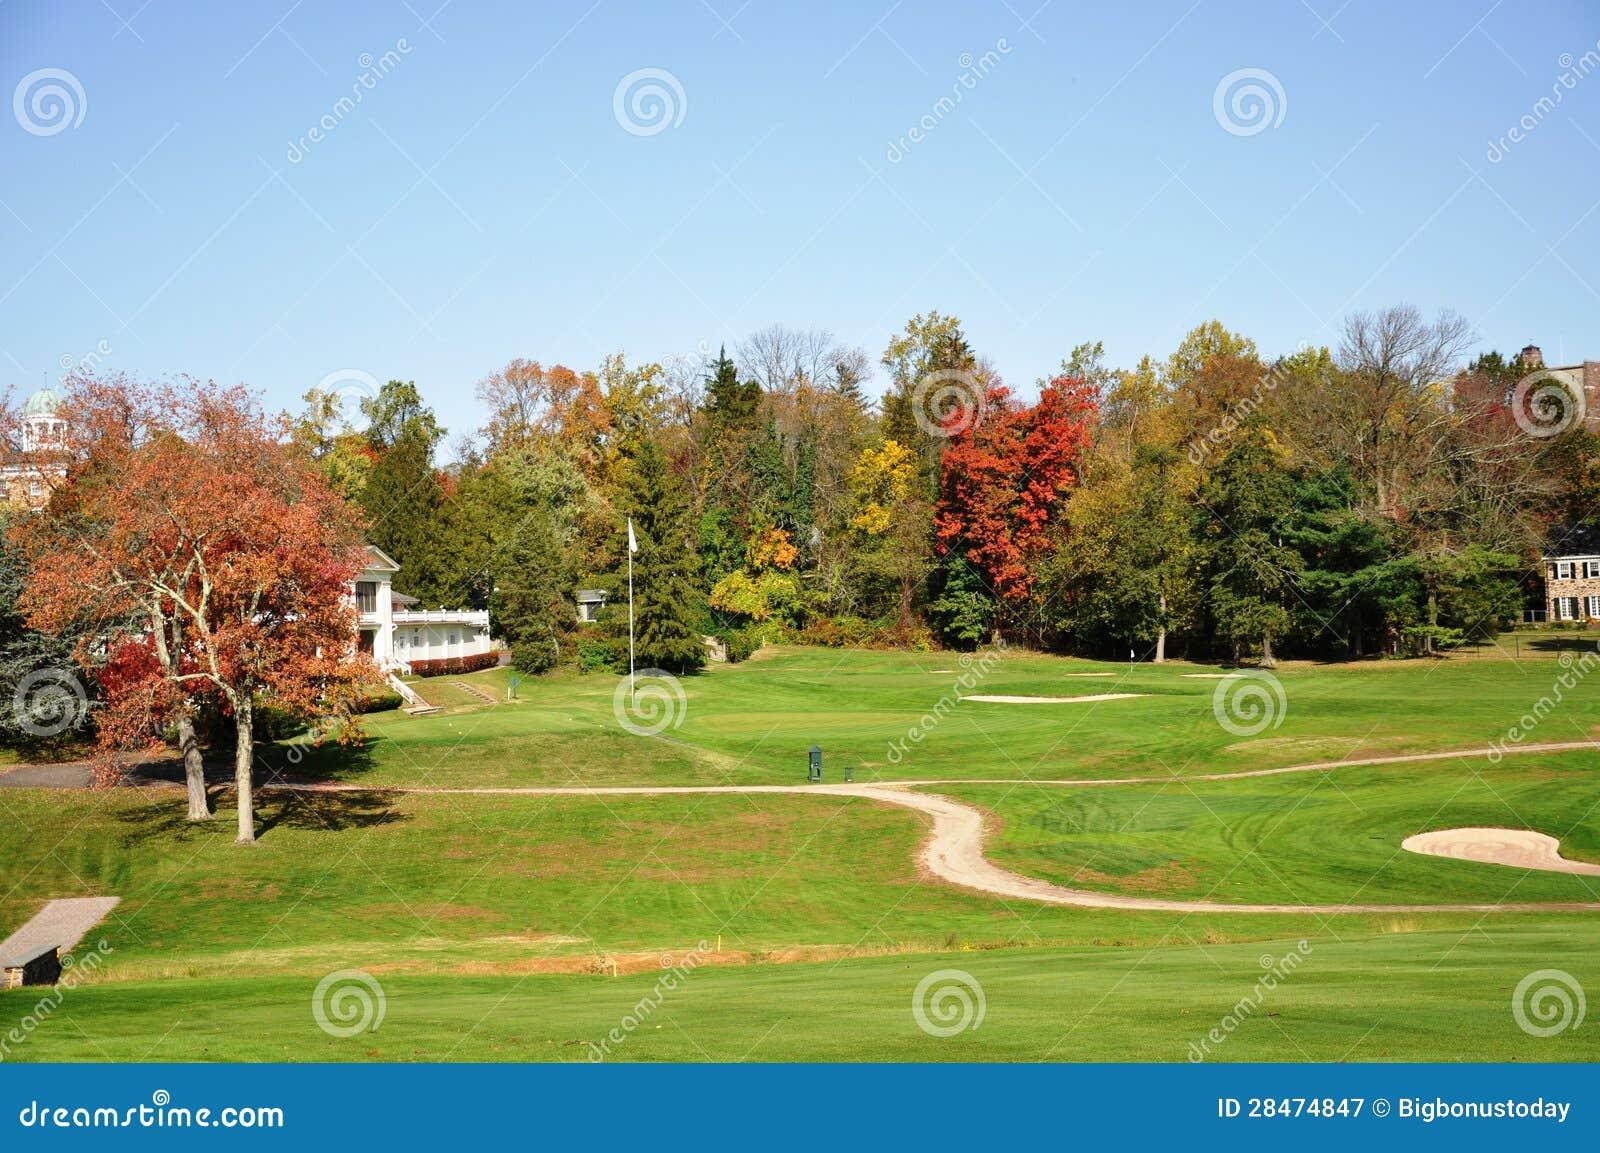 Princeton pole golfowe